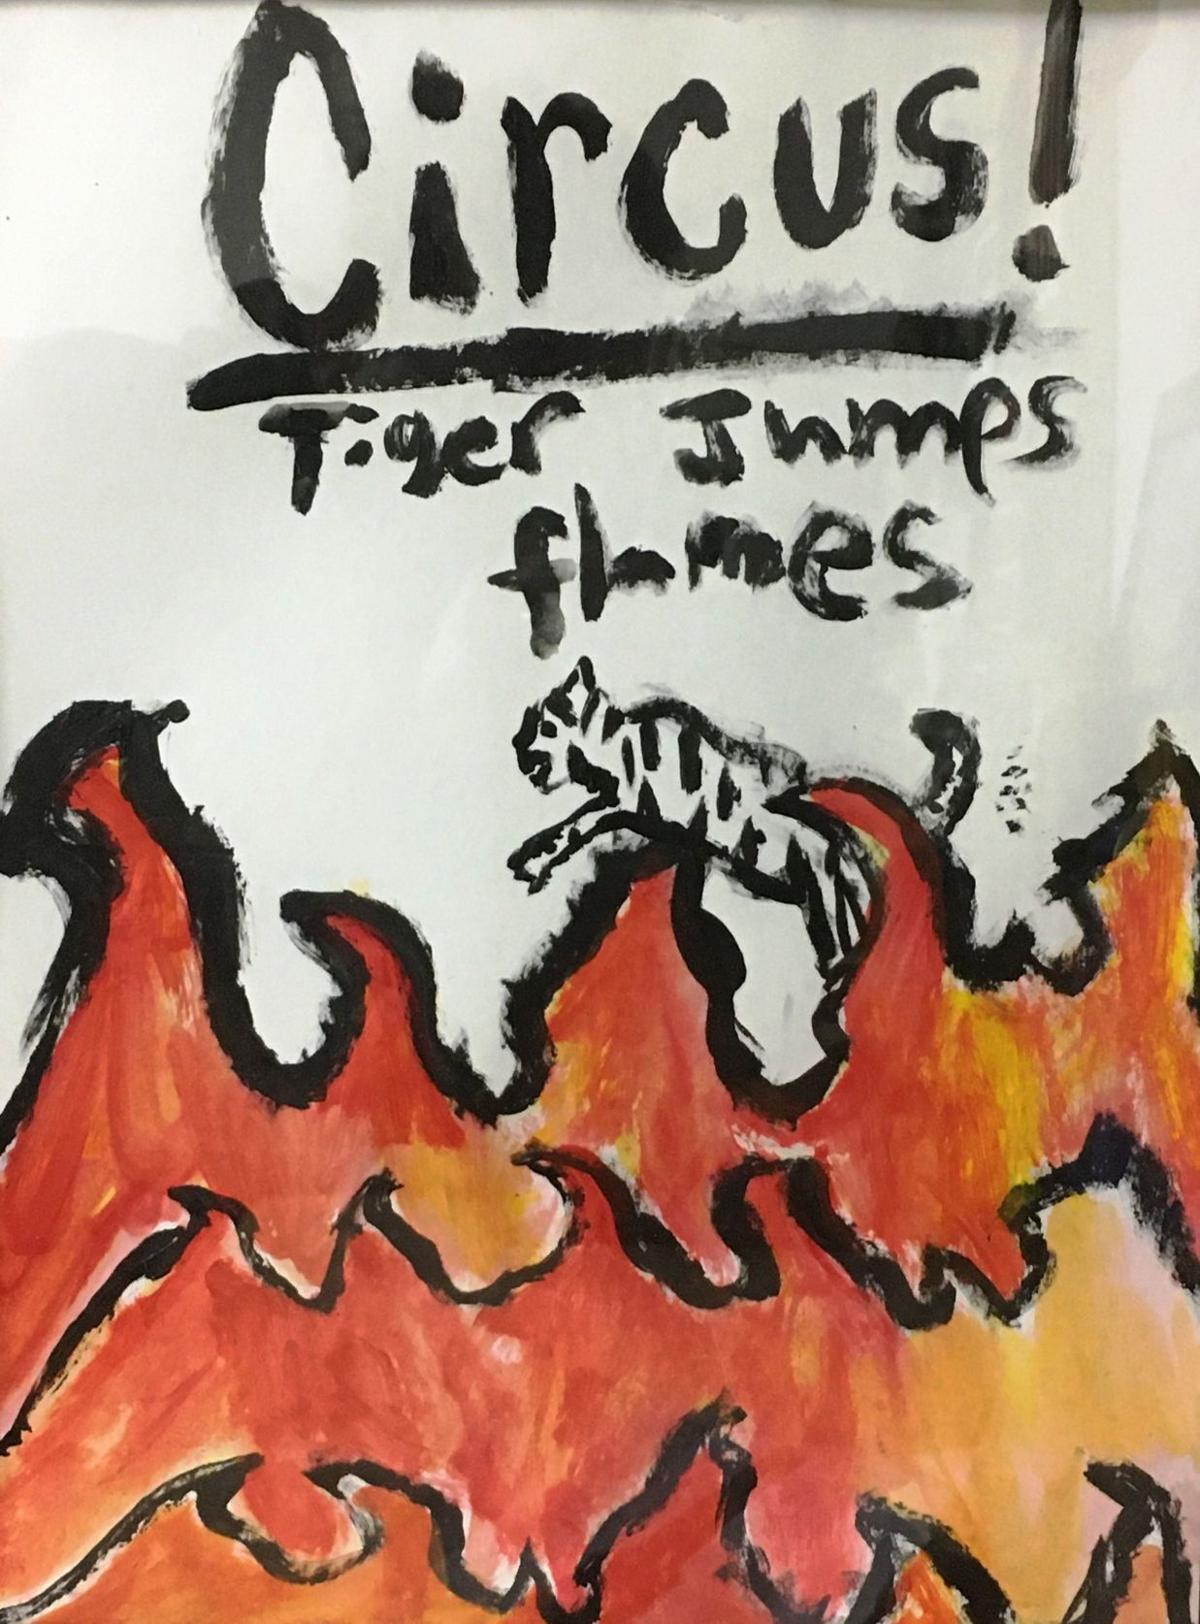 Circus! Tiger Jumps Flames